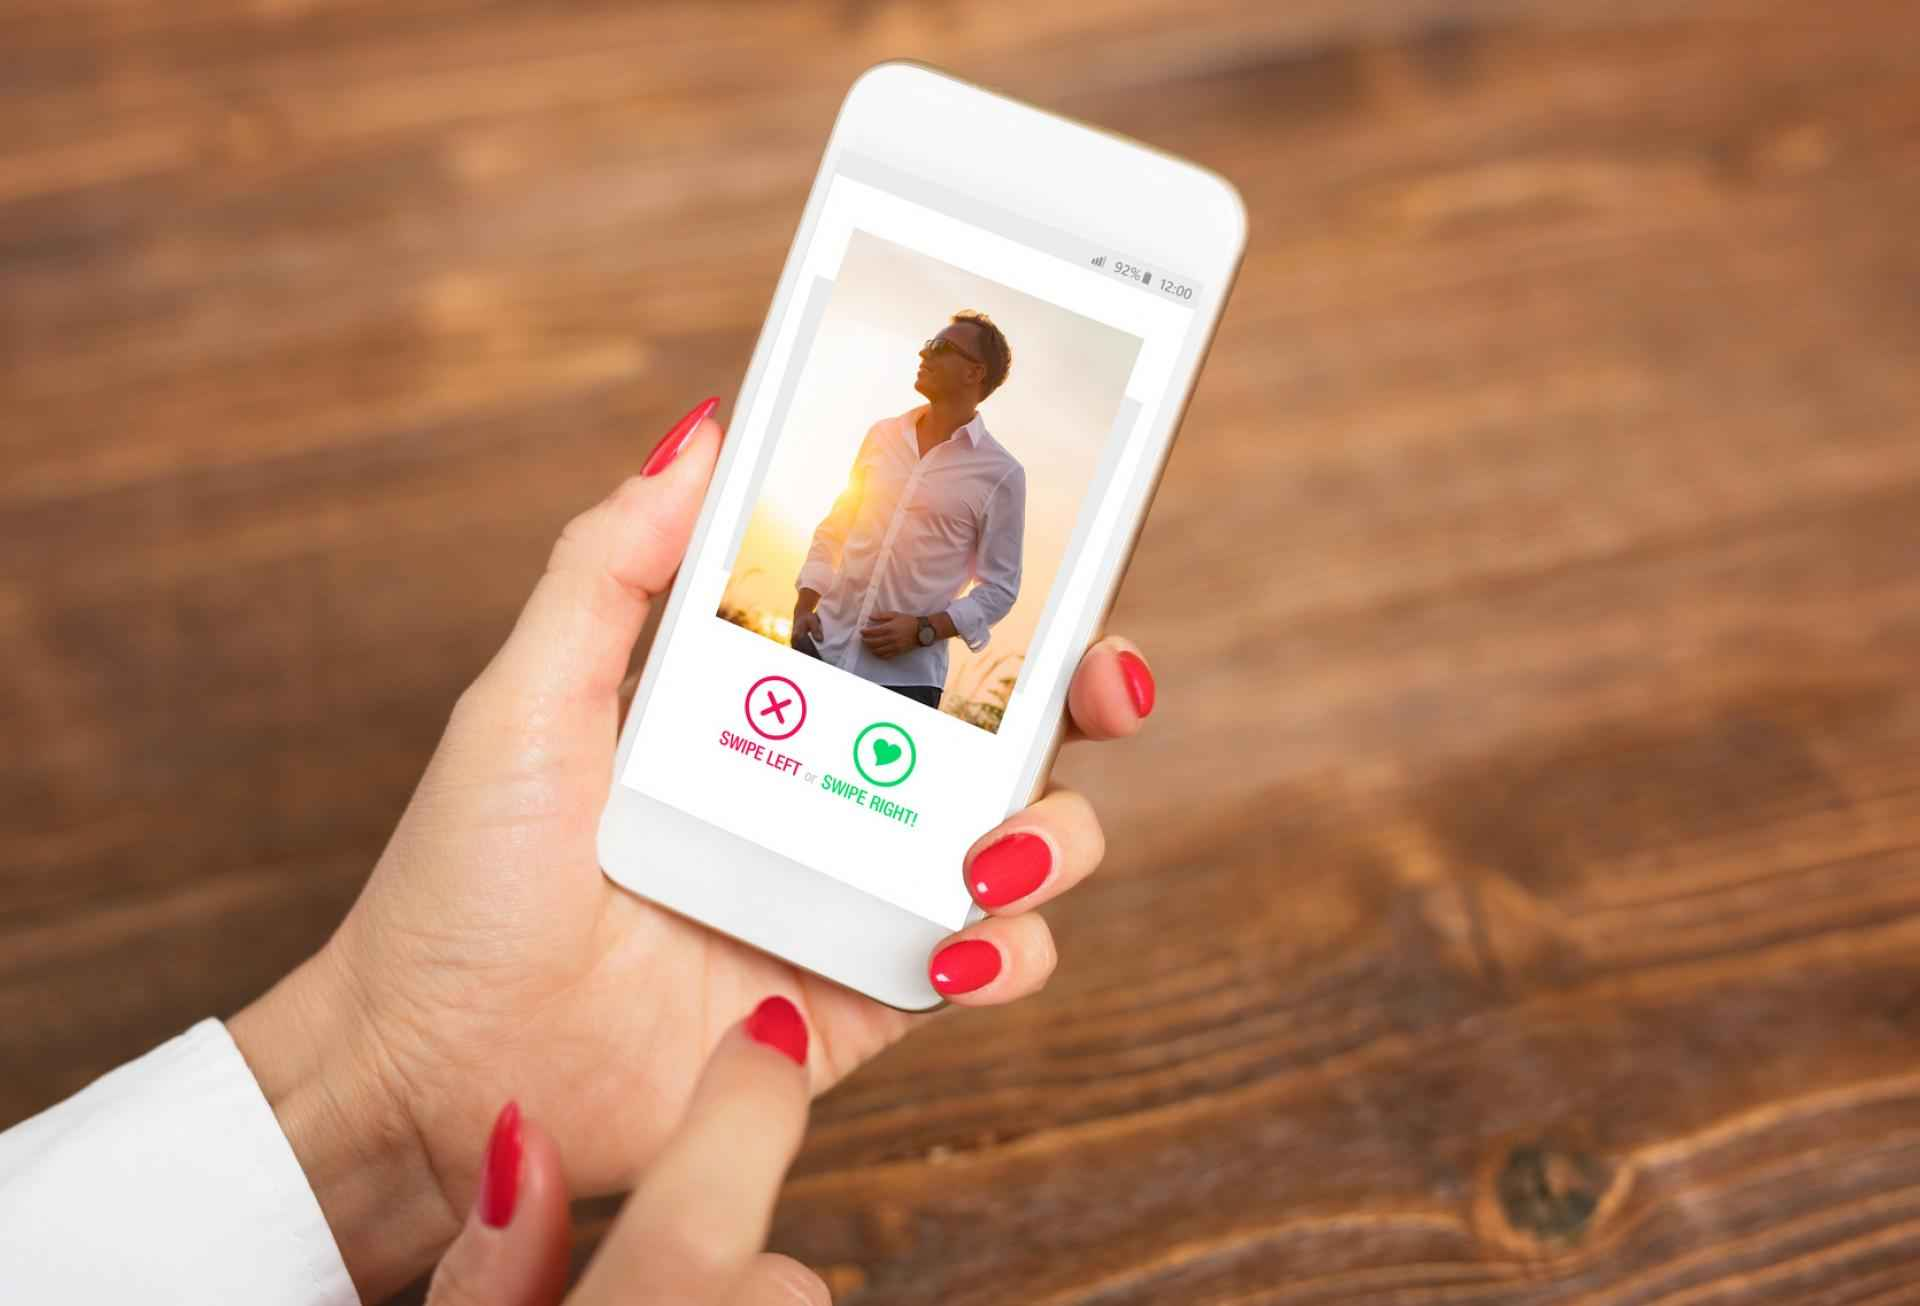 Warum Dating nach 30 anders ist SDC.com